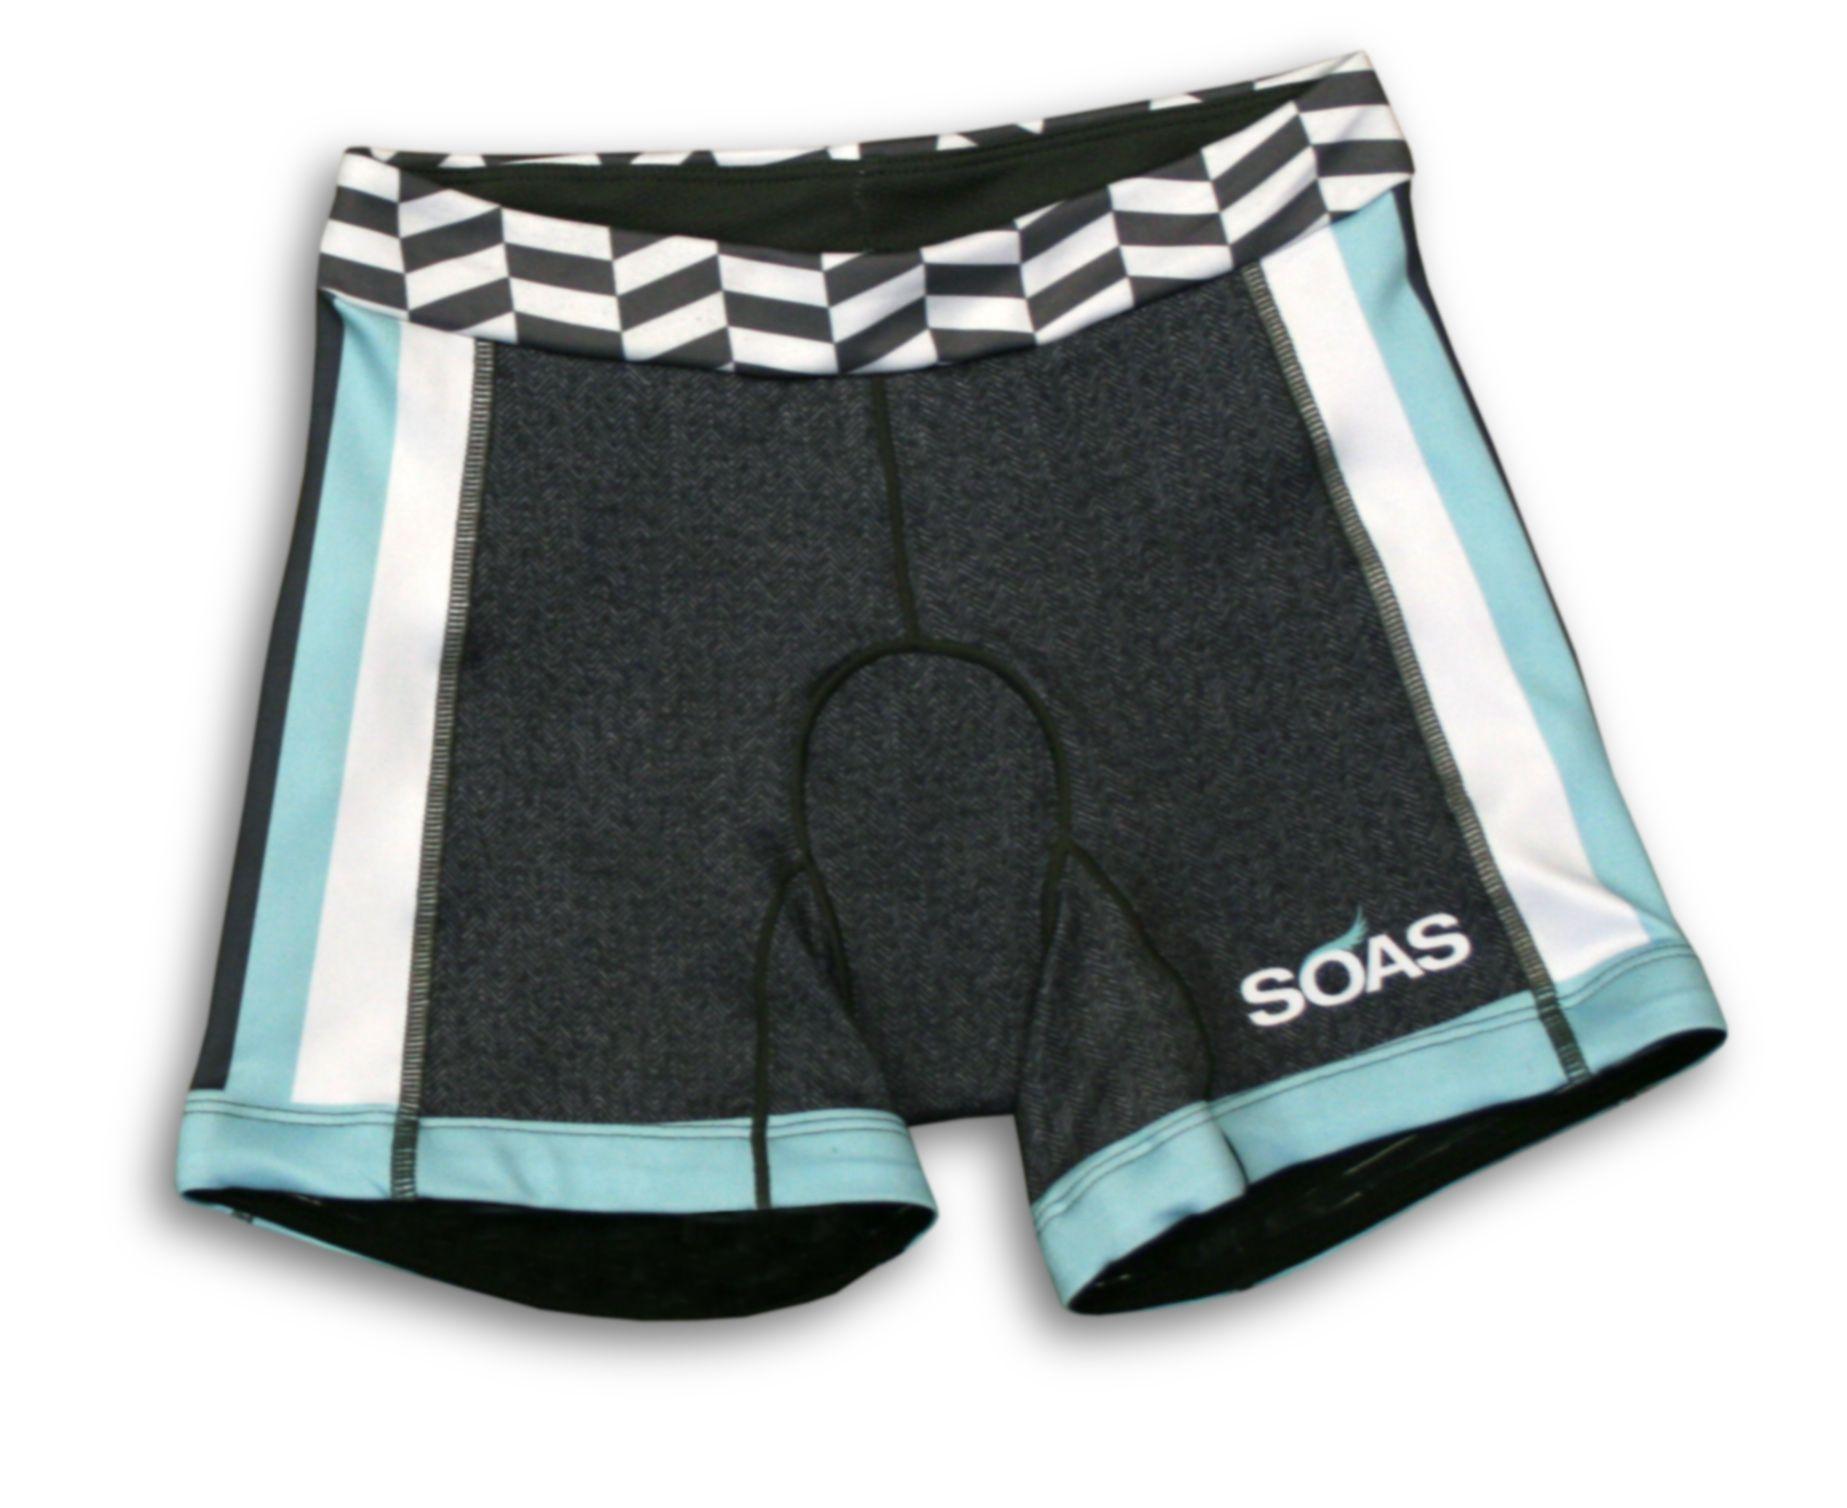 SOAS Racing -- Herringbone Shorts